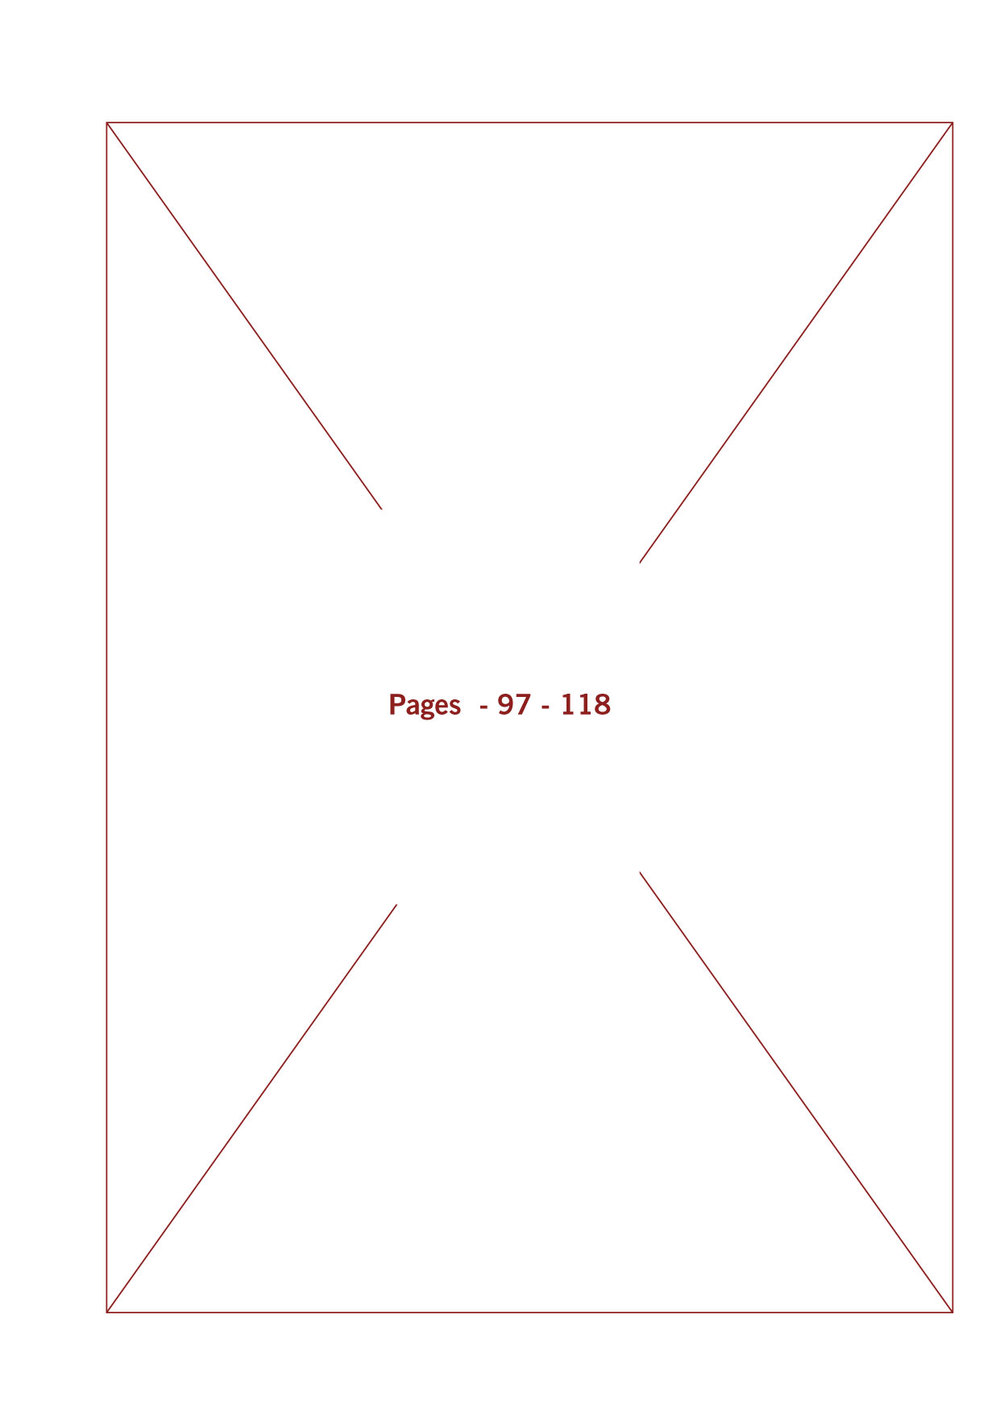 LANDinc_11-91-01-01-01.jpg